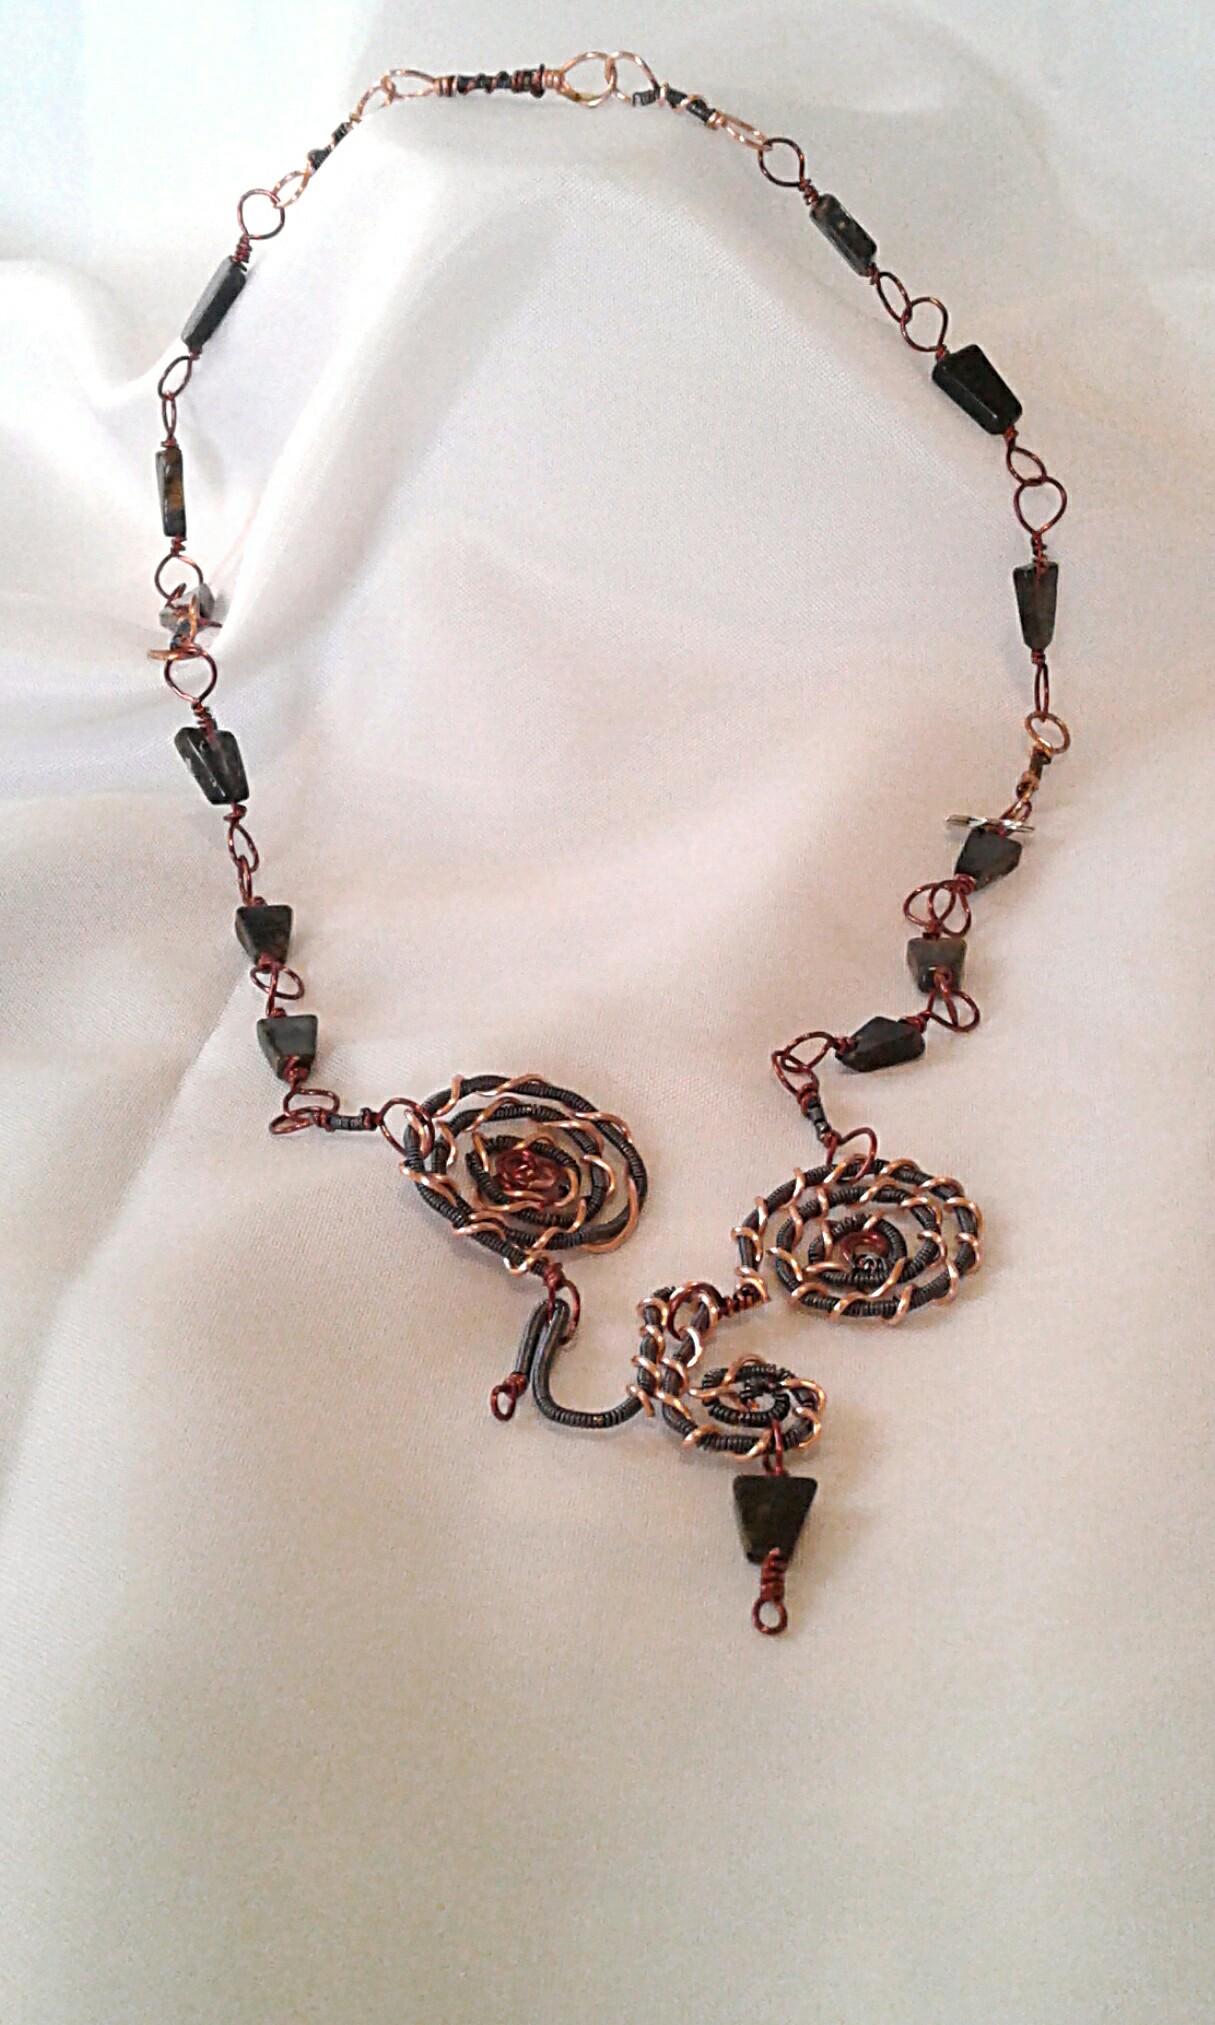 Full shot of the Sigil Necklace.